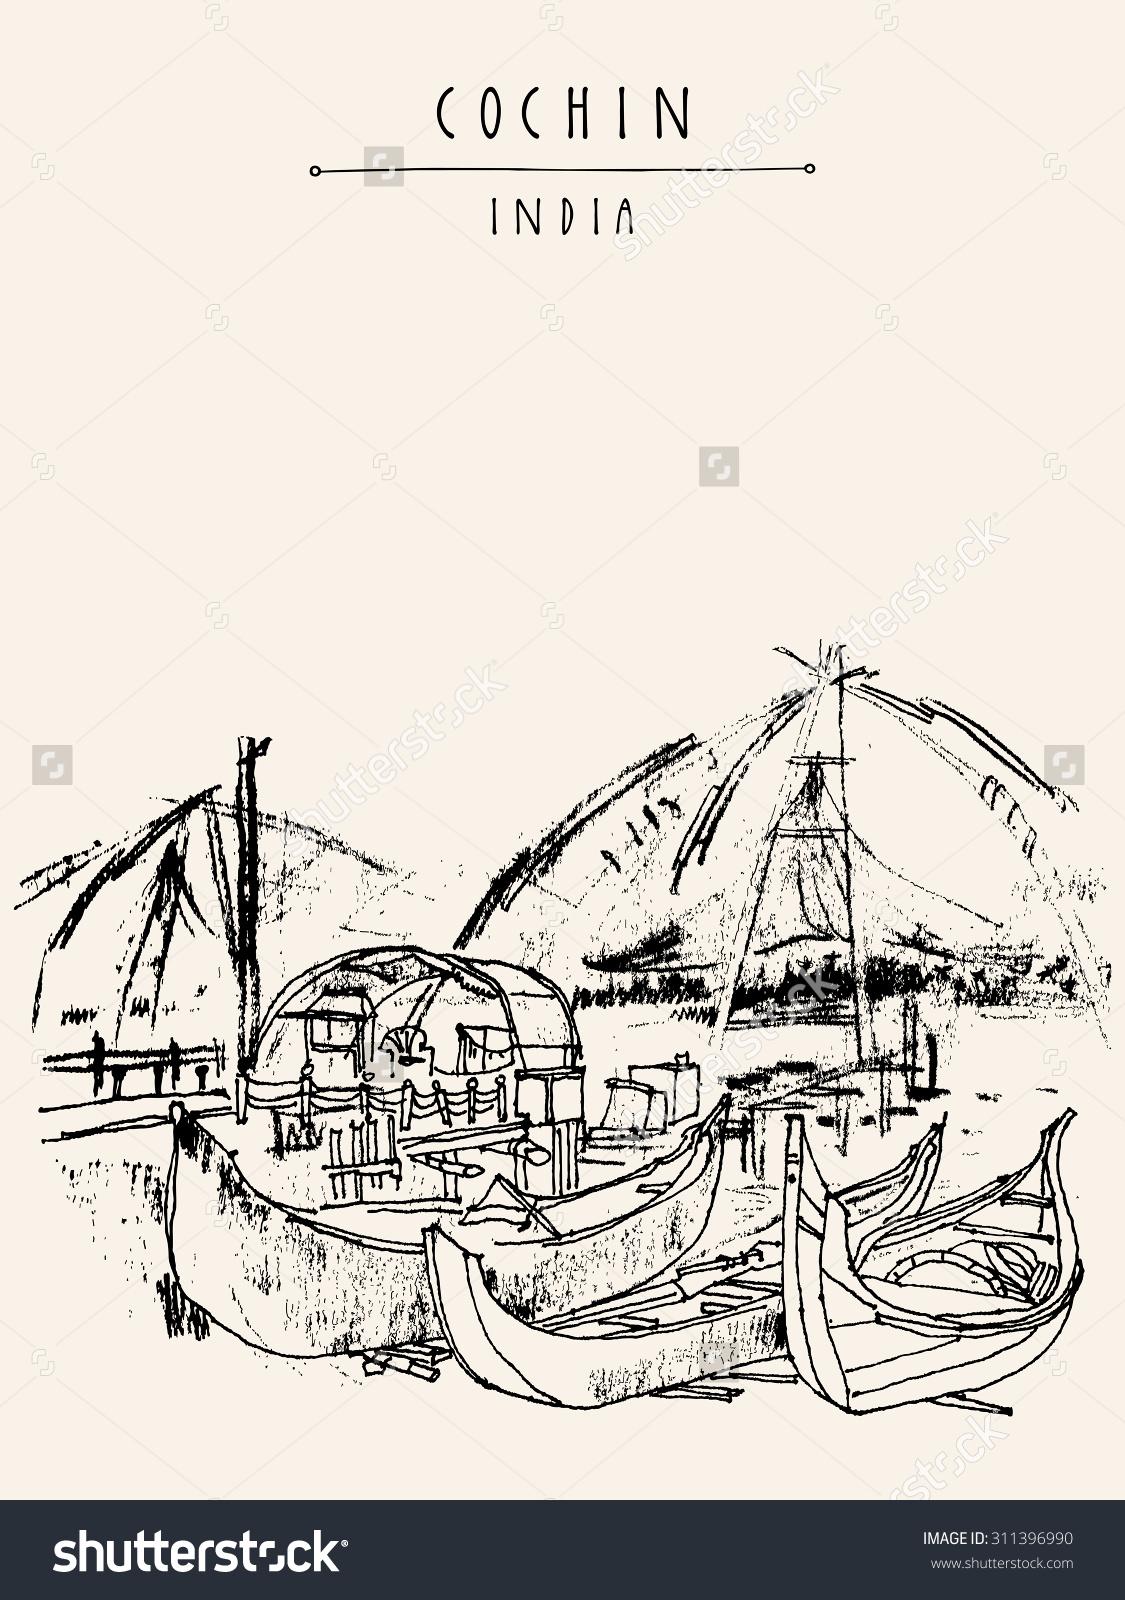 Cochin Kerala India Wooden Boats Chinese Stock Vector 311396990.